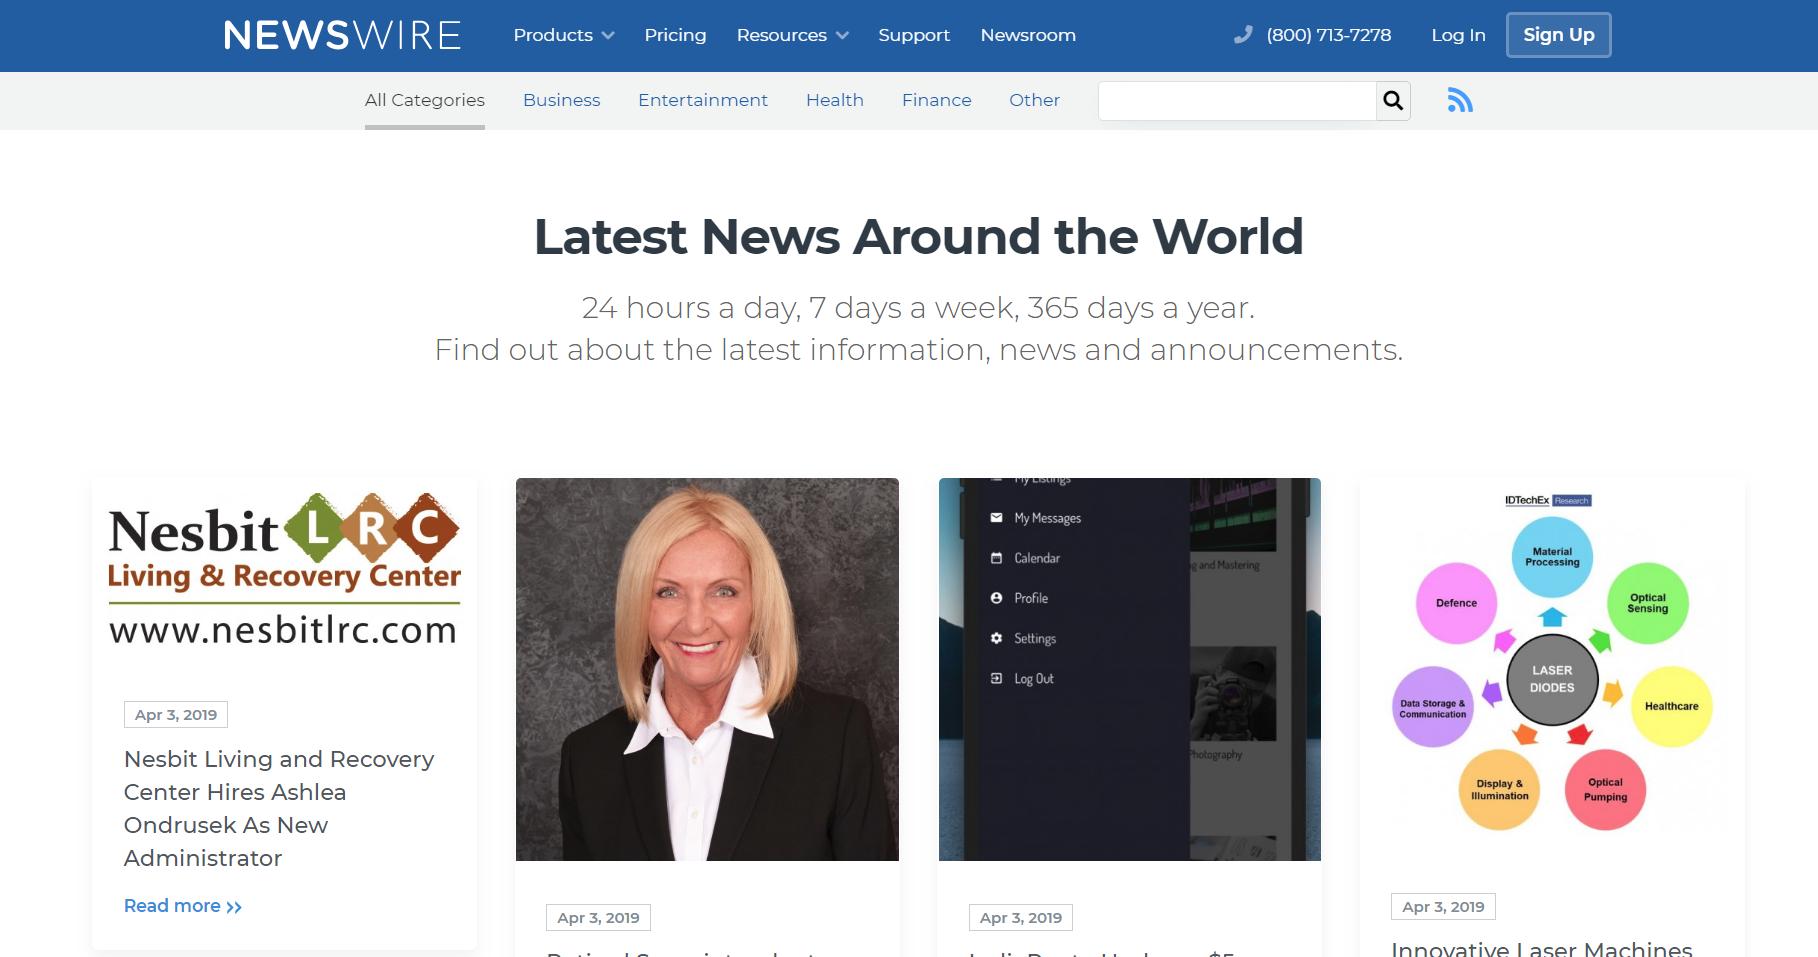 Newswire Demo - The Latest News Around the World